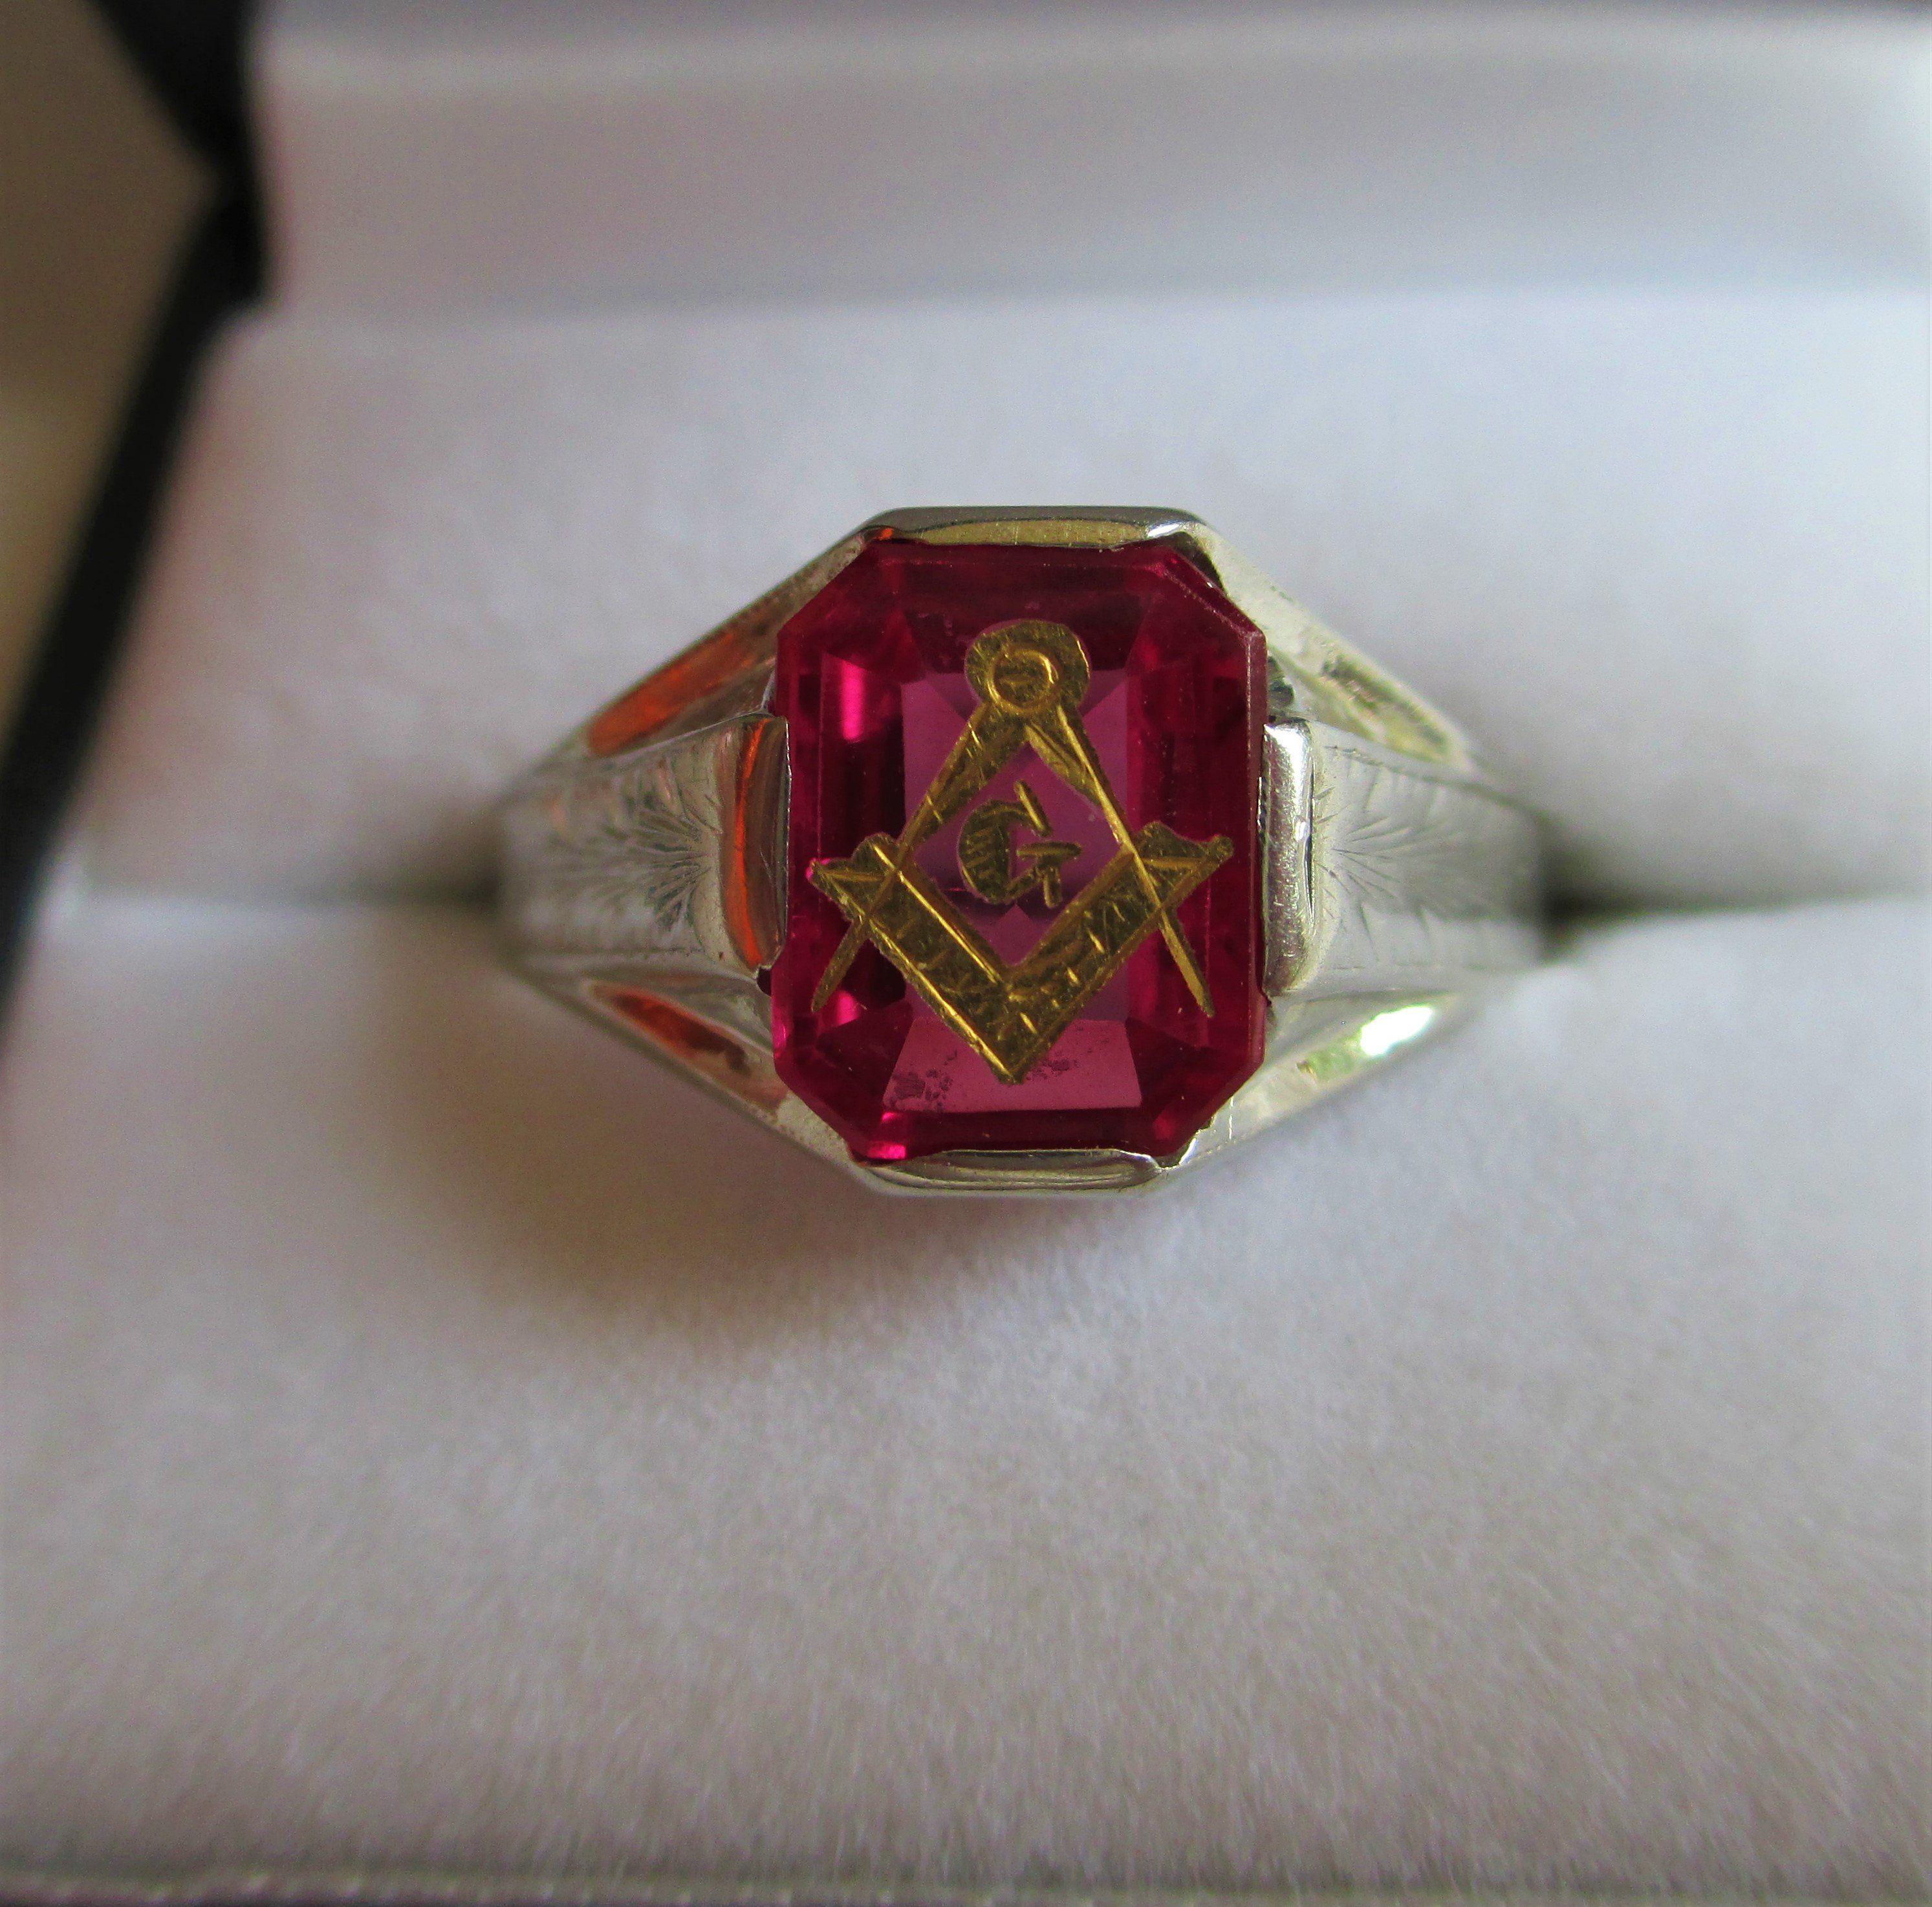 Antique 10k White Gold Masonic Ring Freemasonry Masonic Signet Ring Very Old Carved Ruby Red Stone 10k Size 11 Ruby Masonic Masonic Ring Signet Ring Red Stone